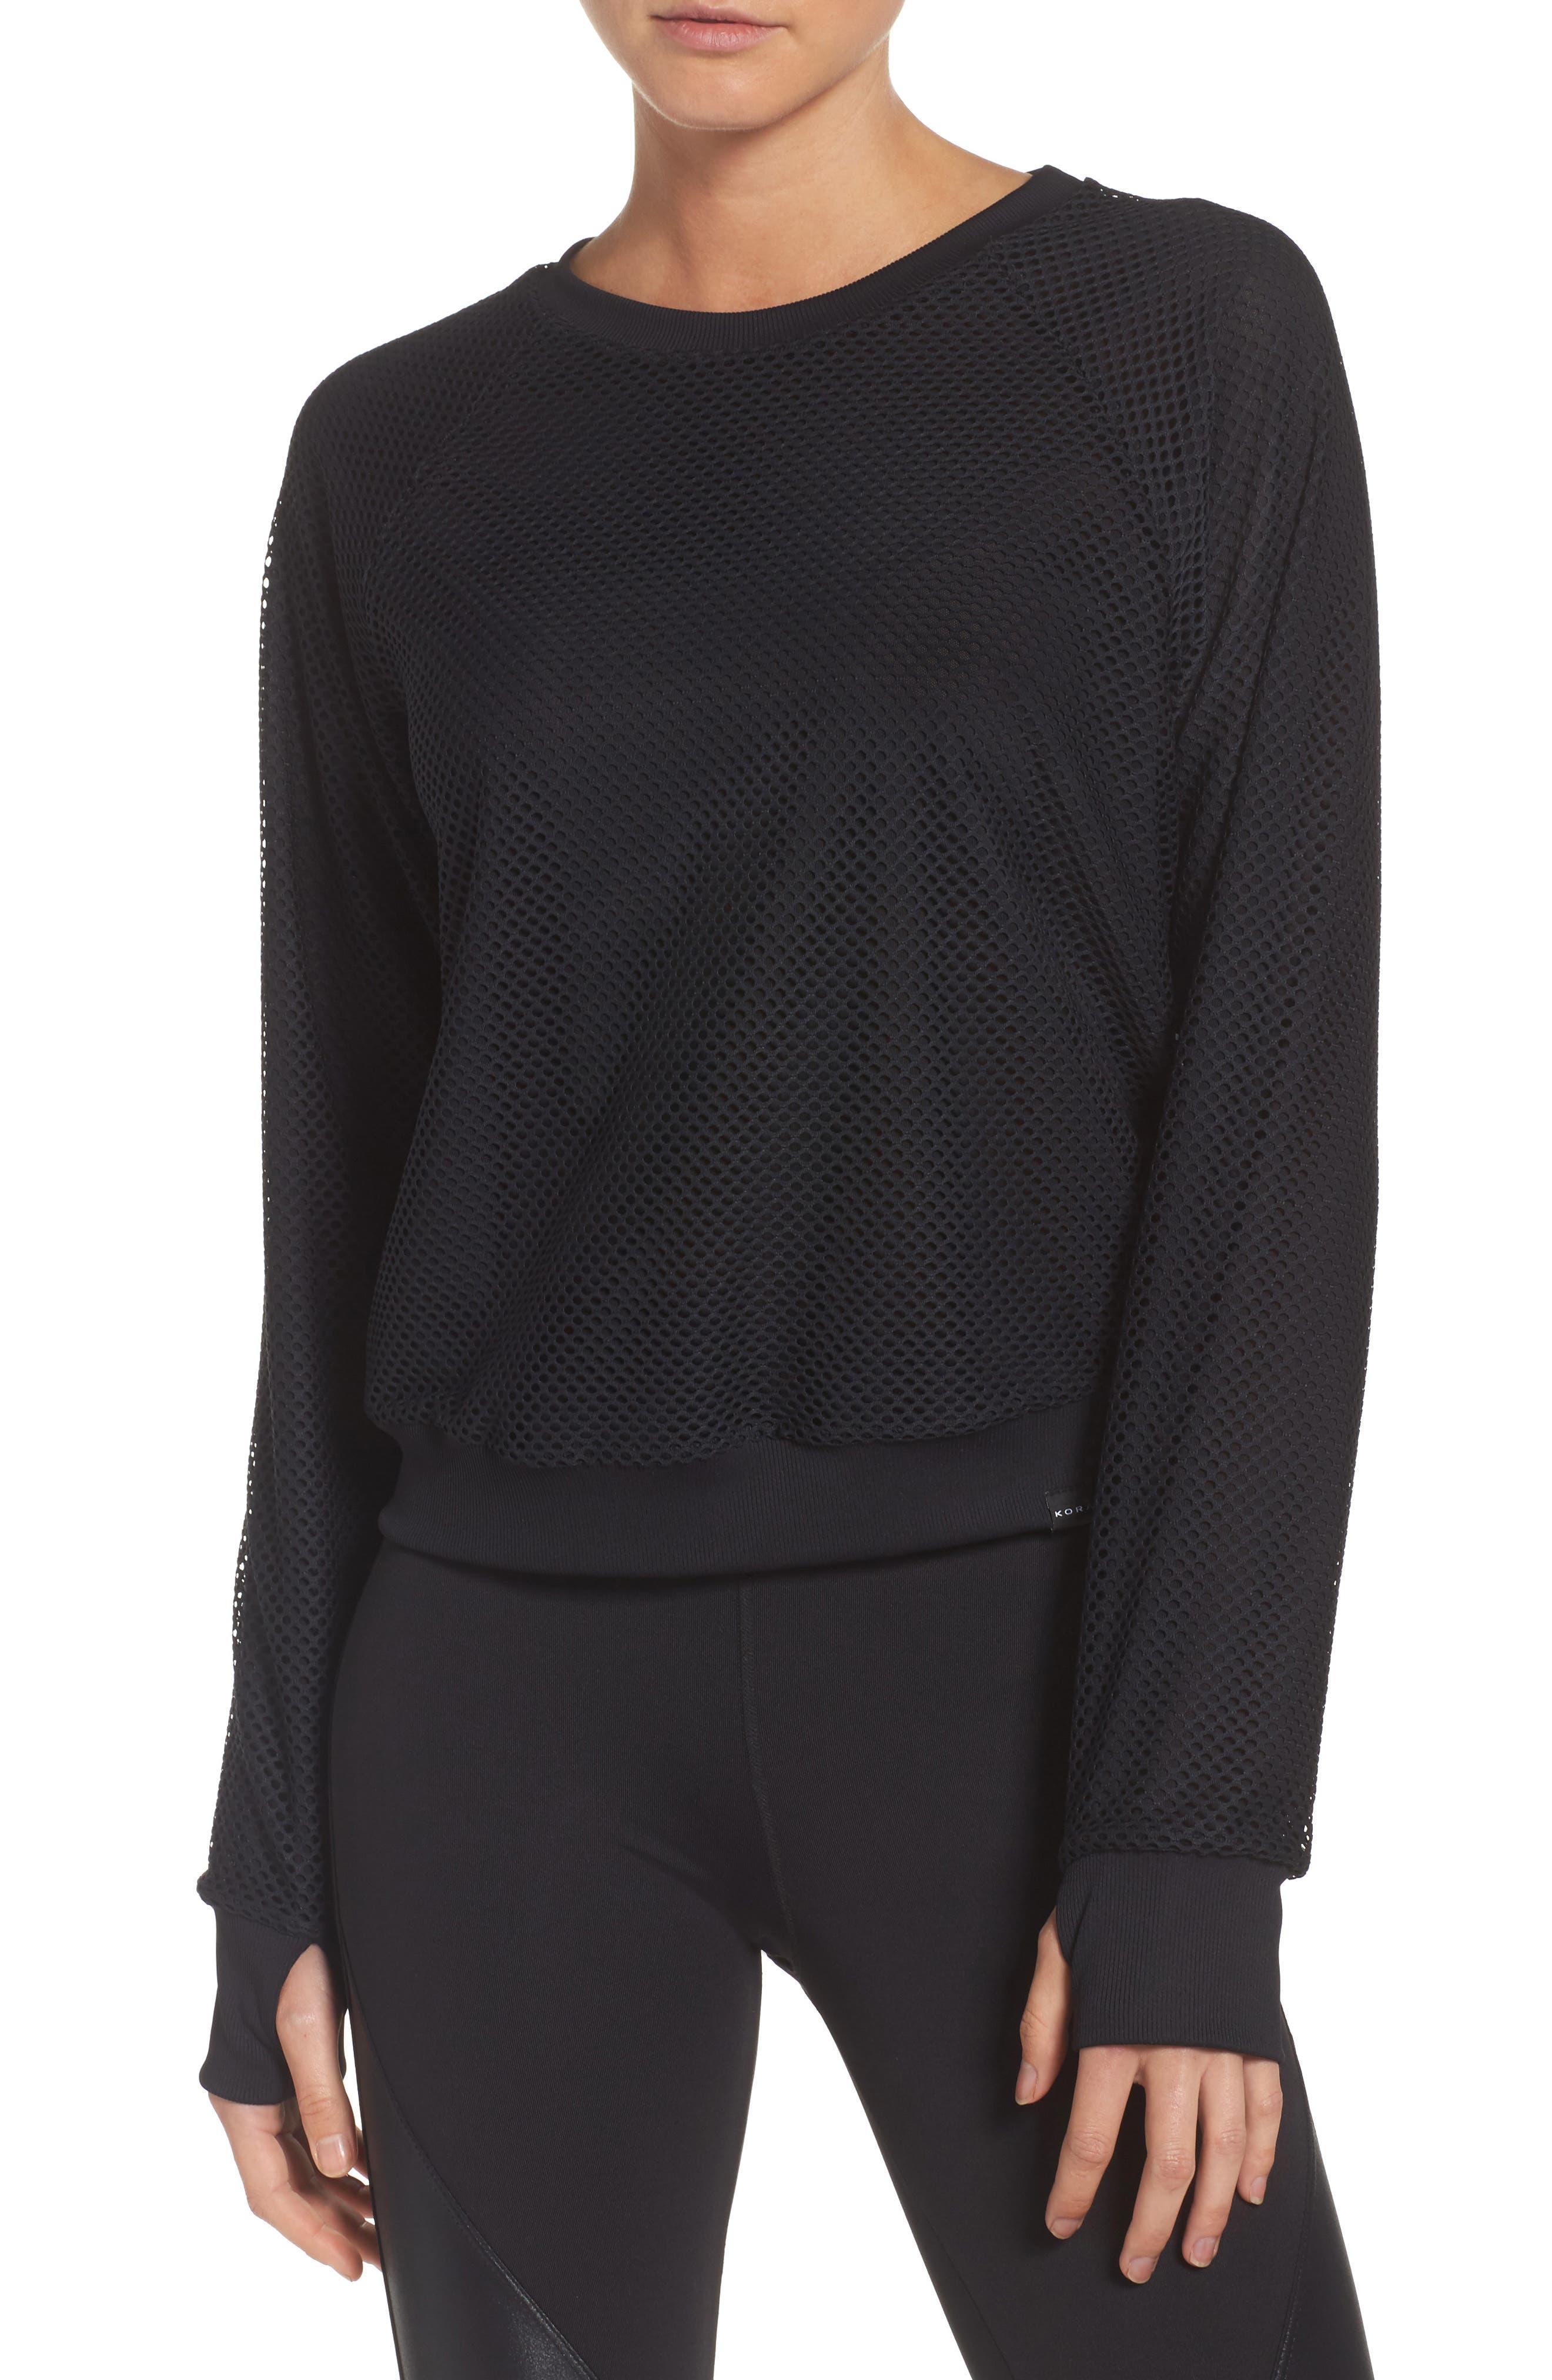 Sofia Crop Pullover,                         Main,                         color, Black